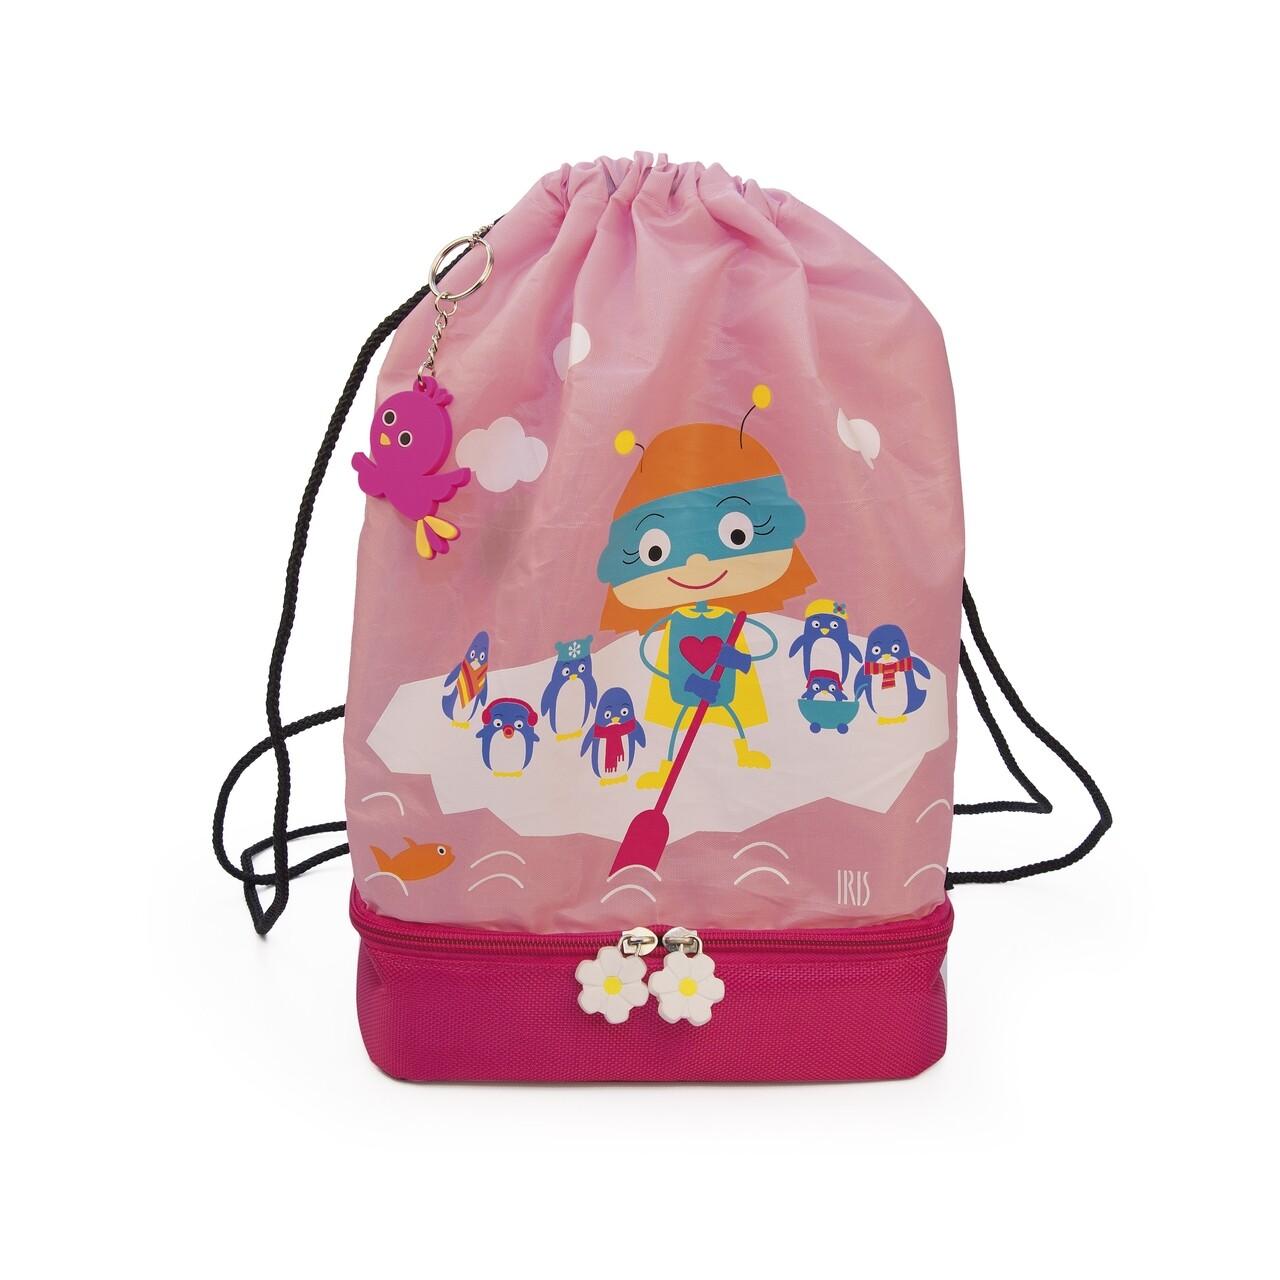 Rucsac pentru copii cu compatiment termoizolant 2in1 SnackRico, Iris Barcelona, 5 L, 21x12x35 cm, roz